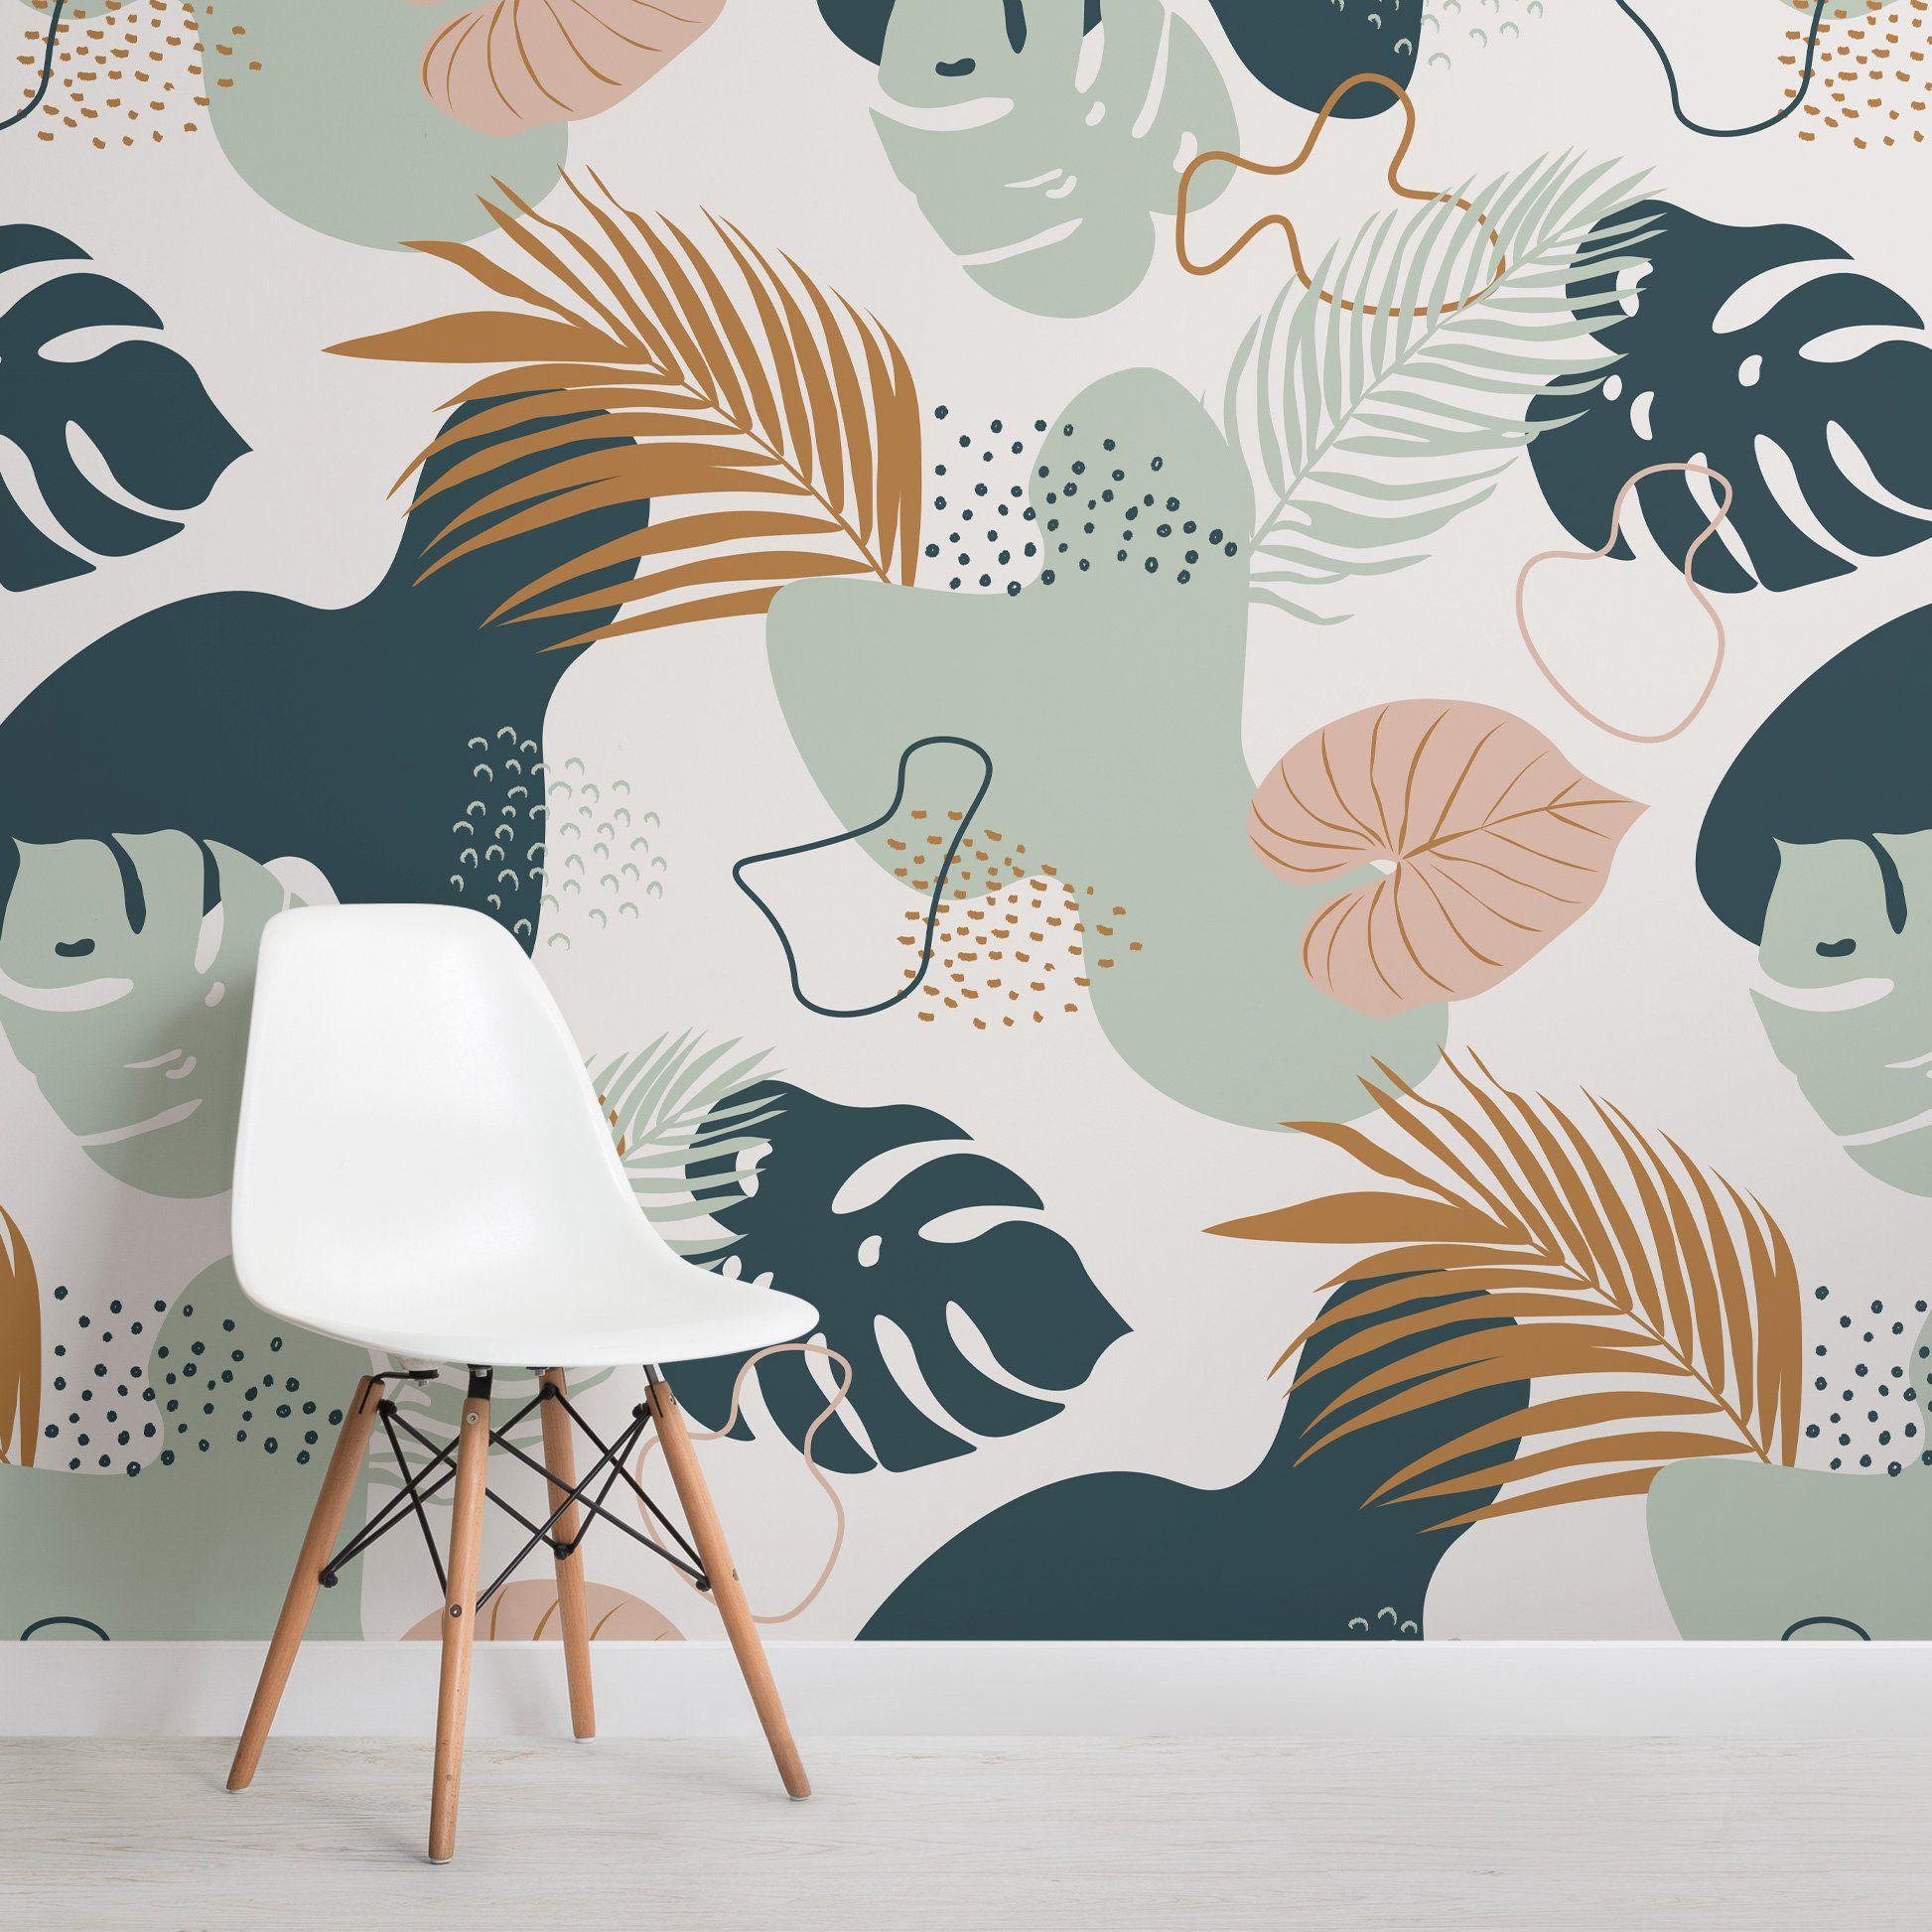 Green Tropical Leaf Pattern Wallpaper Mural Hovia In 2021 Mural Wallpaper Pattern Wallpaper Wall Murals Diy